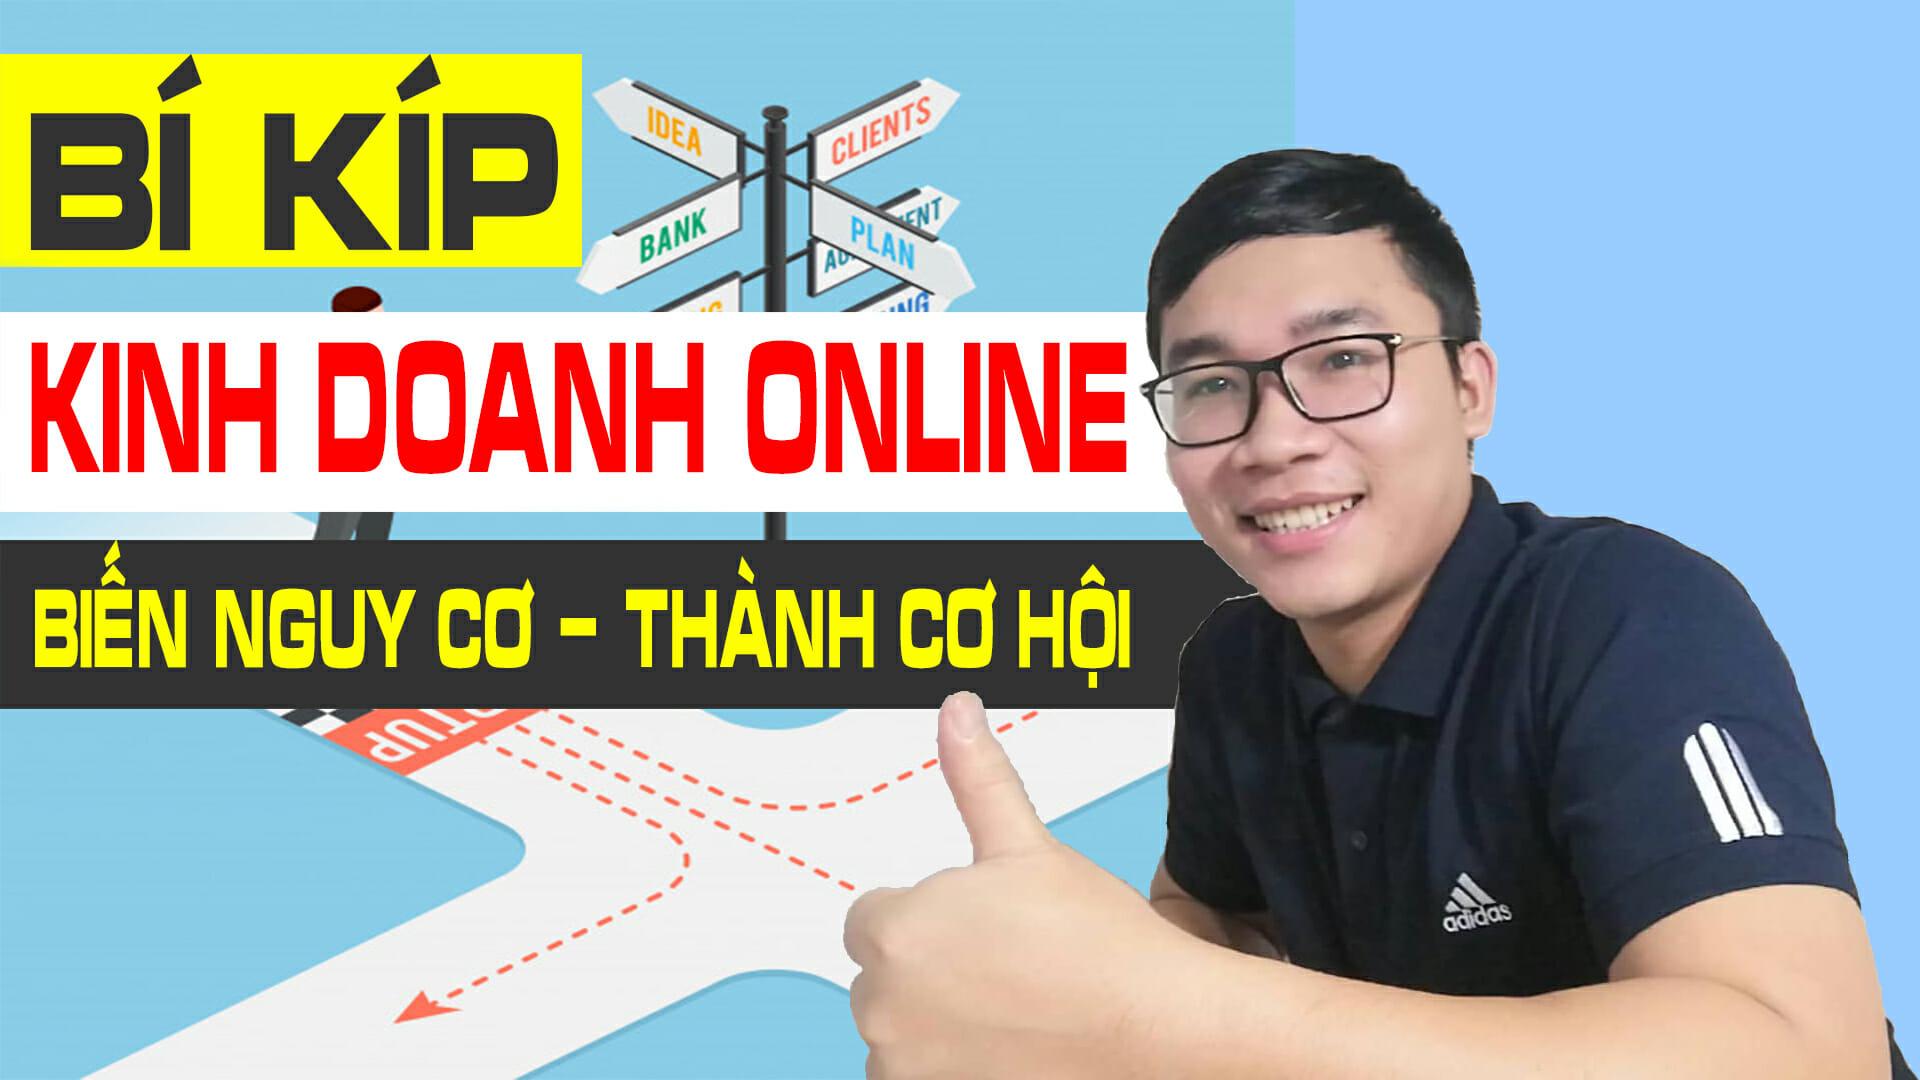 bi-kip-kinh-doanh-online-trong-thoi-ky-kho-khan-bien-nguy-co-thanh-co-hoi